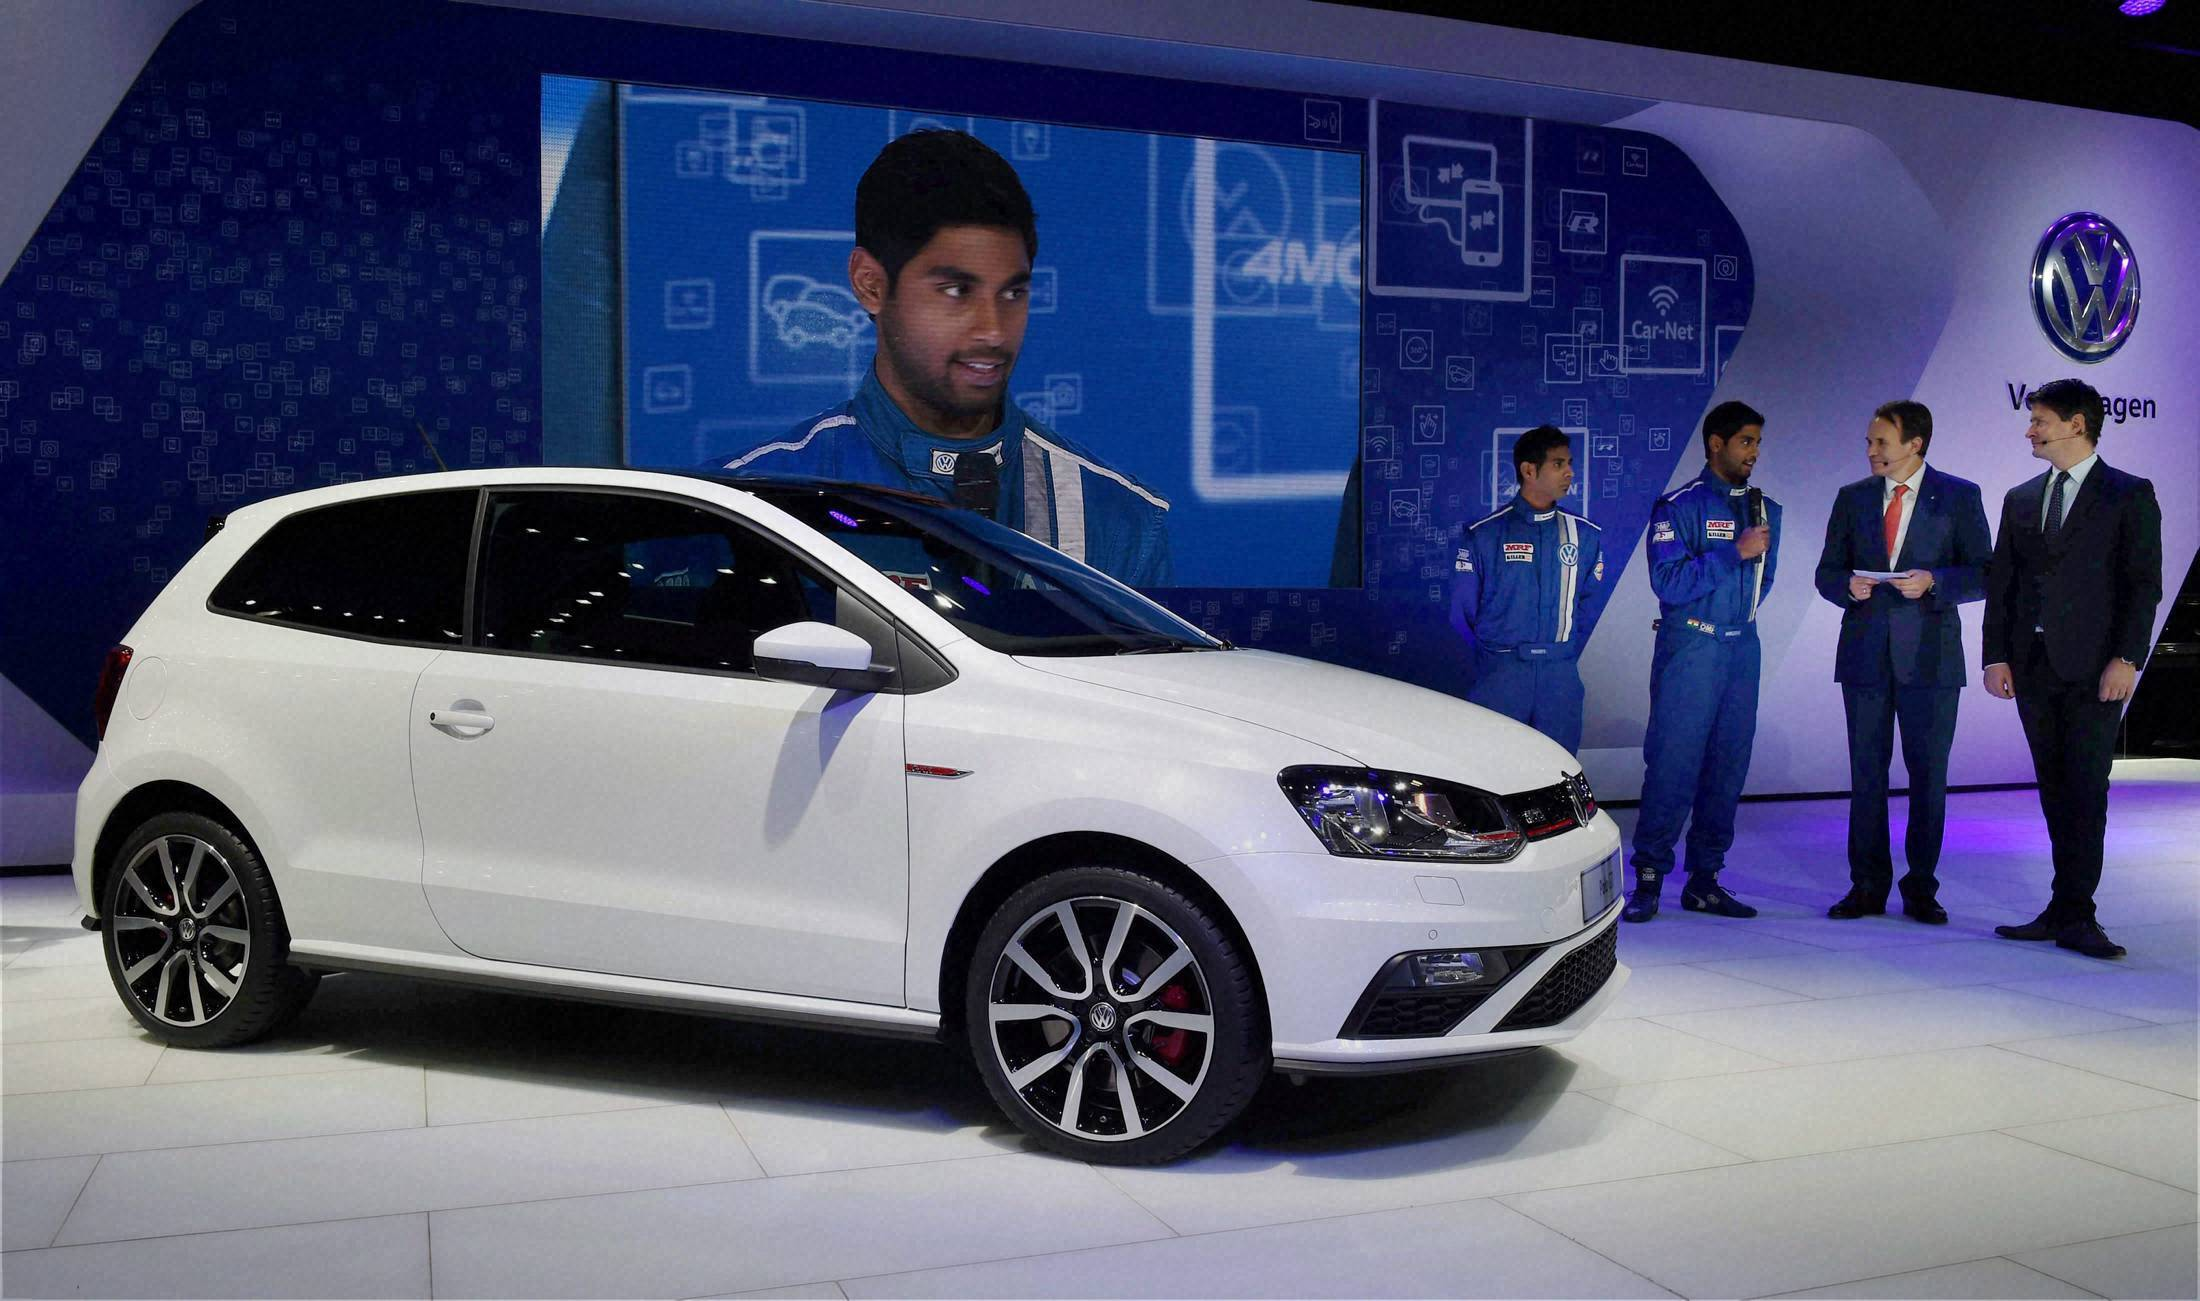 POLO GTI at Auto Expo 2016